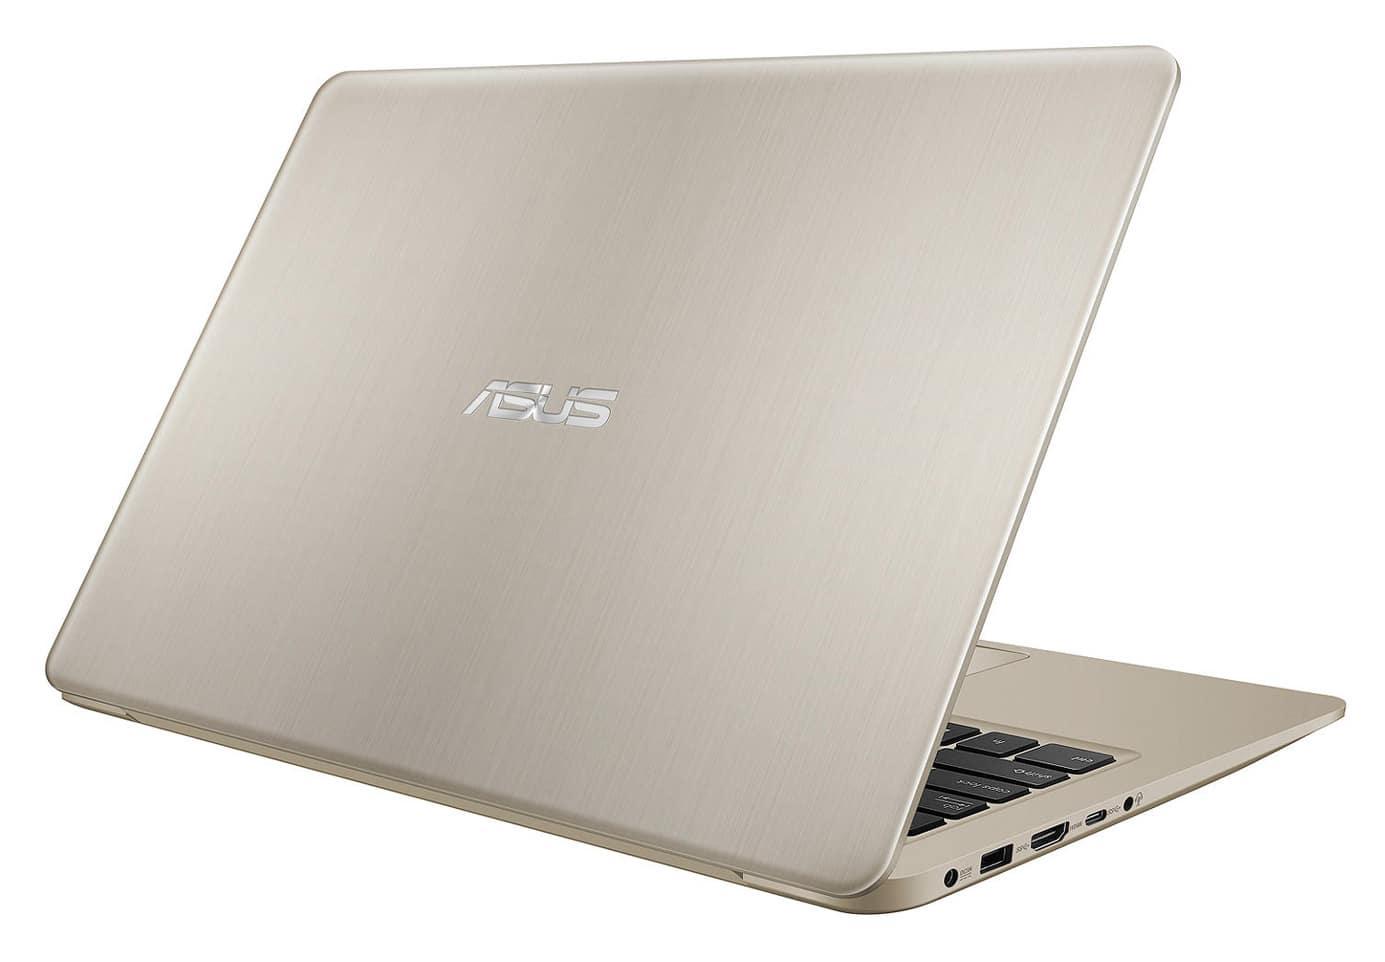 "Asus VivoBook S410UA-EB962T, Ultrabook 14"" Or Full i7 SSD256 (720€)"